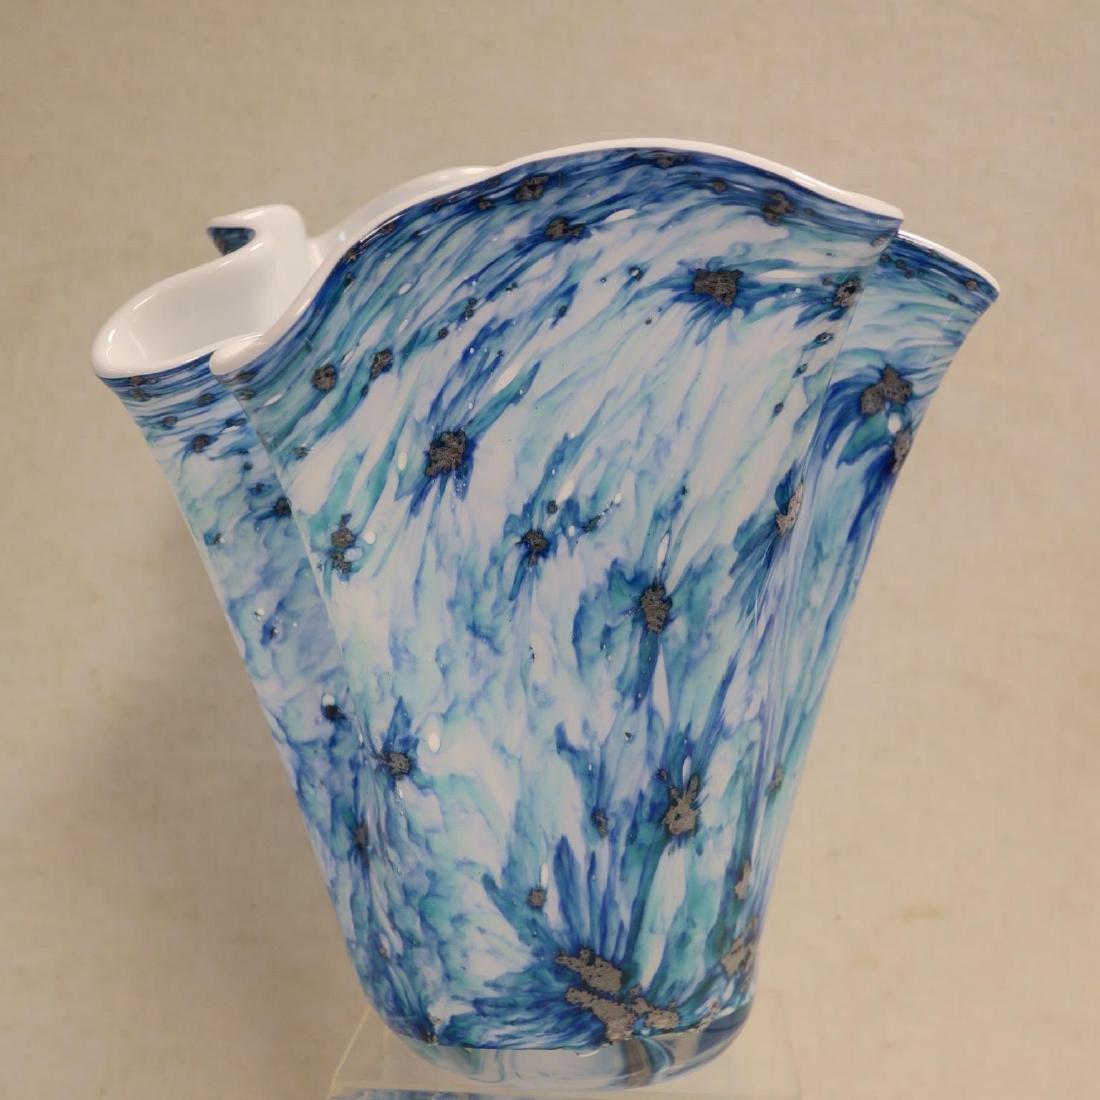 Jack in the Pulpit, Ruffle Pitcher, Handkerchief Vase: - 2